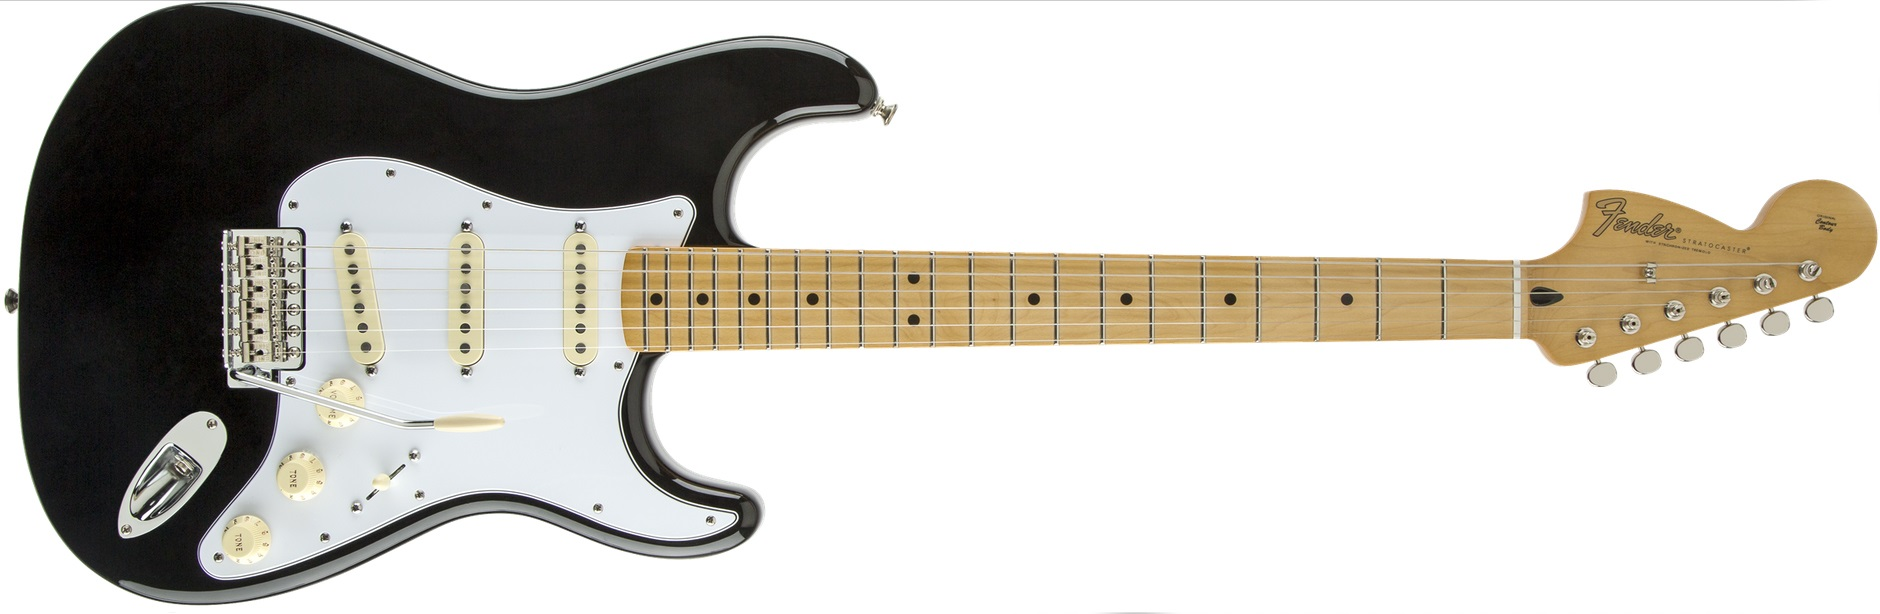 Fender Jimi Hendrix Stratocaster MN BK